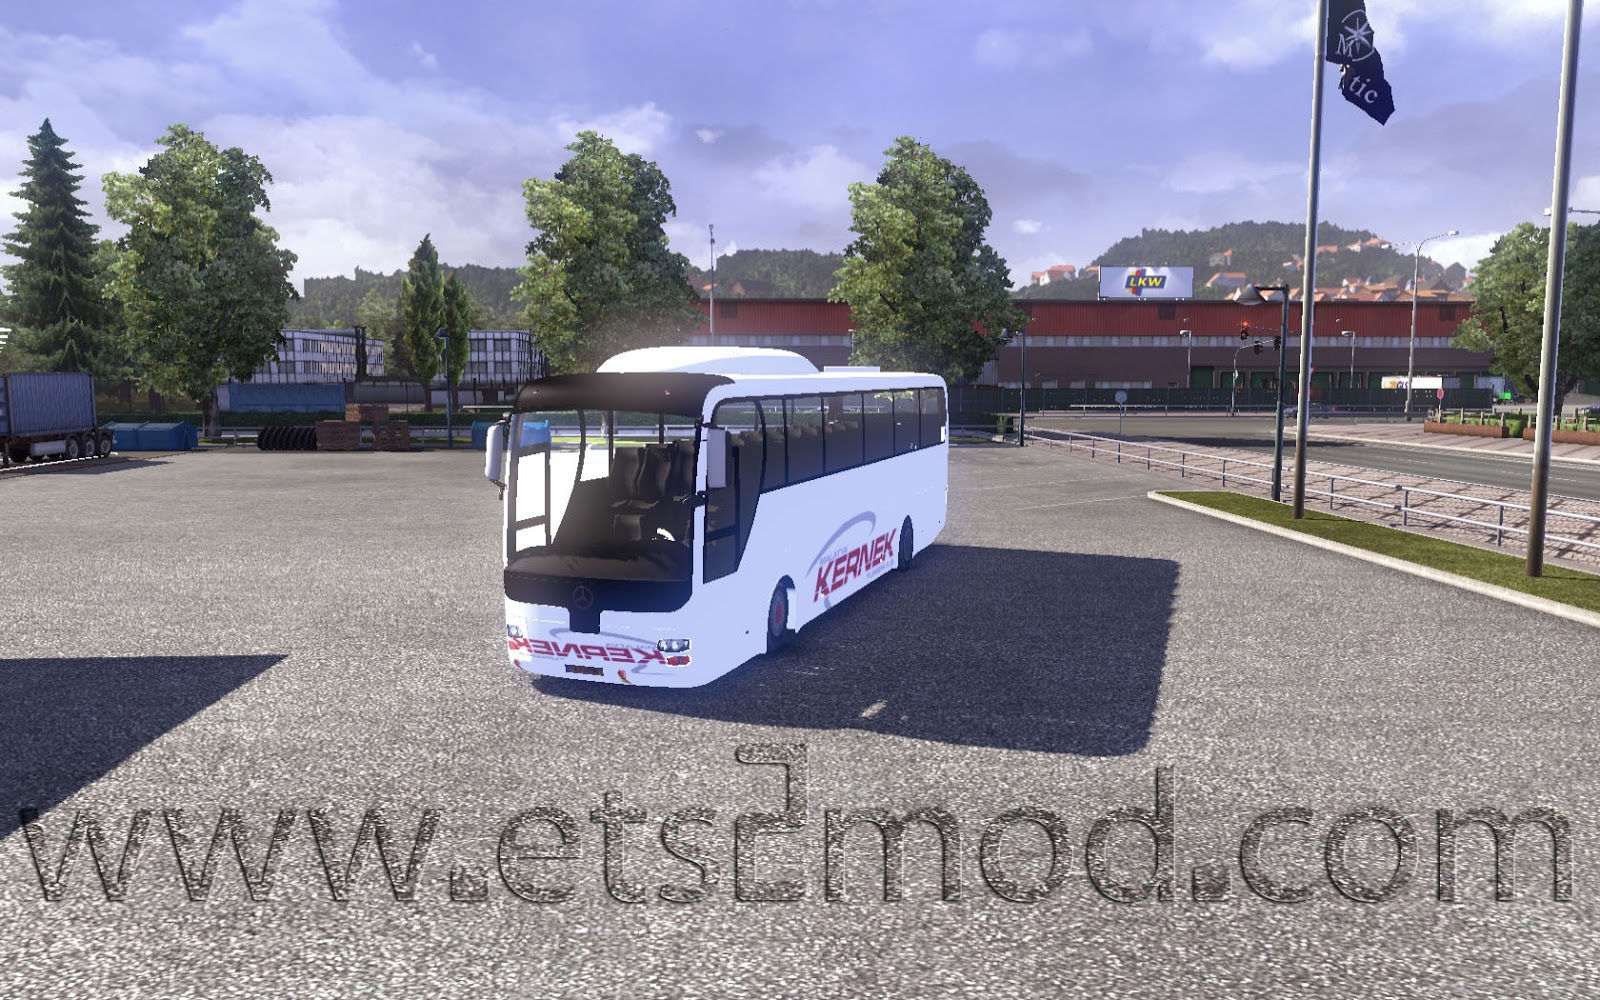 Mod bus mercedes kernek